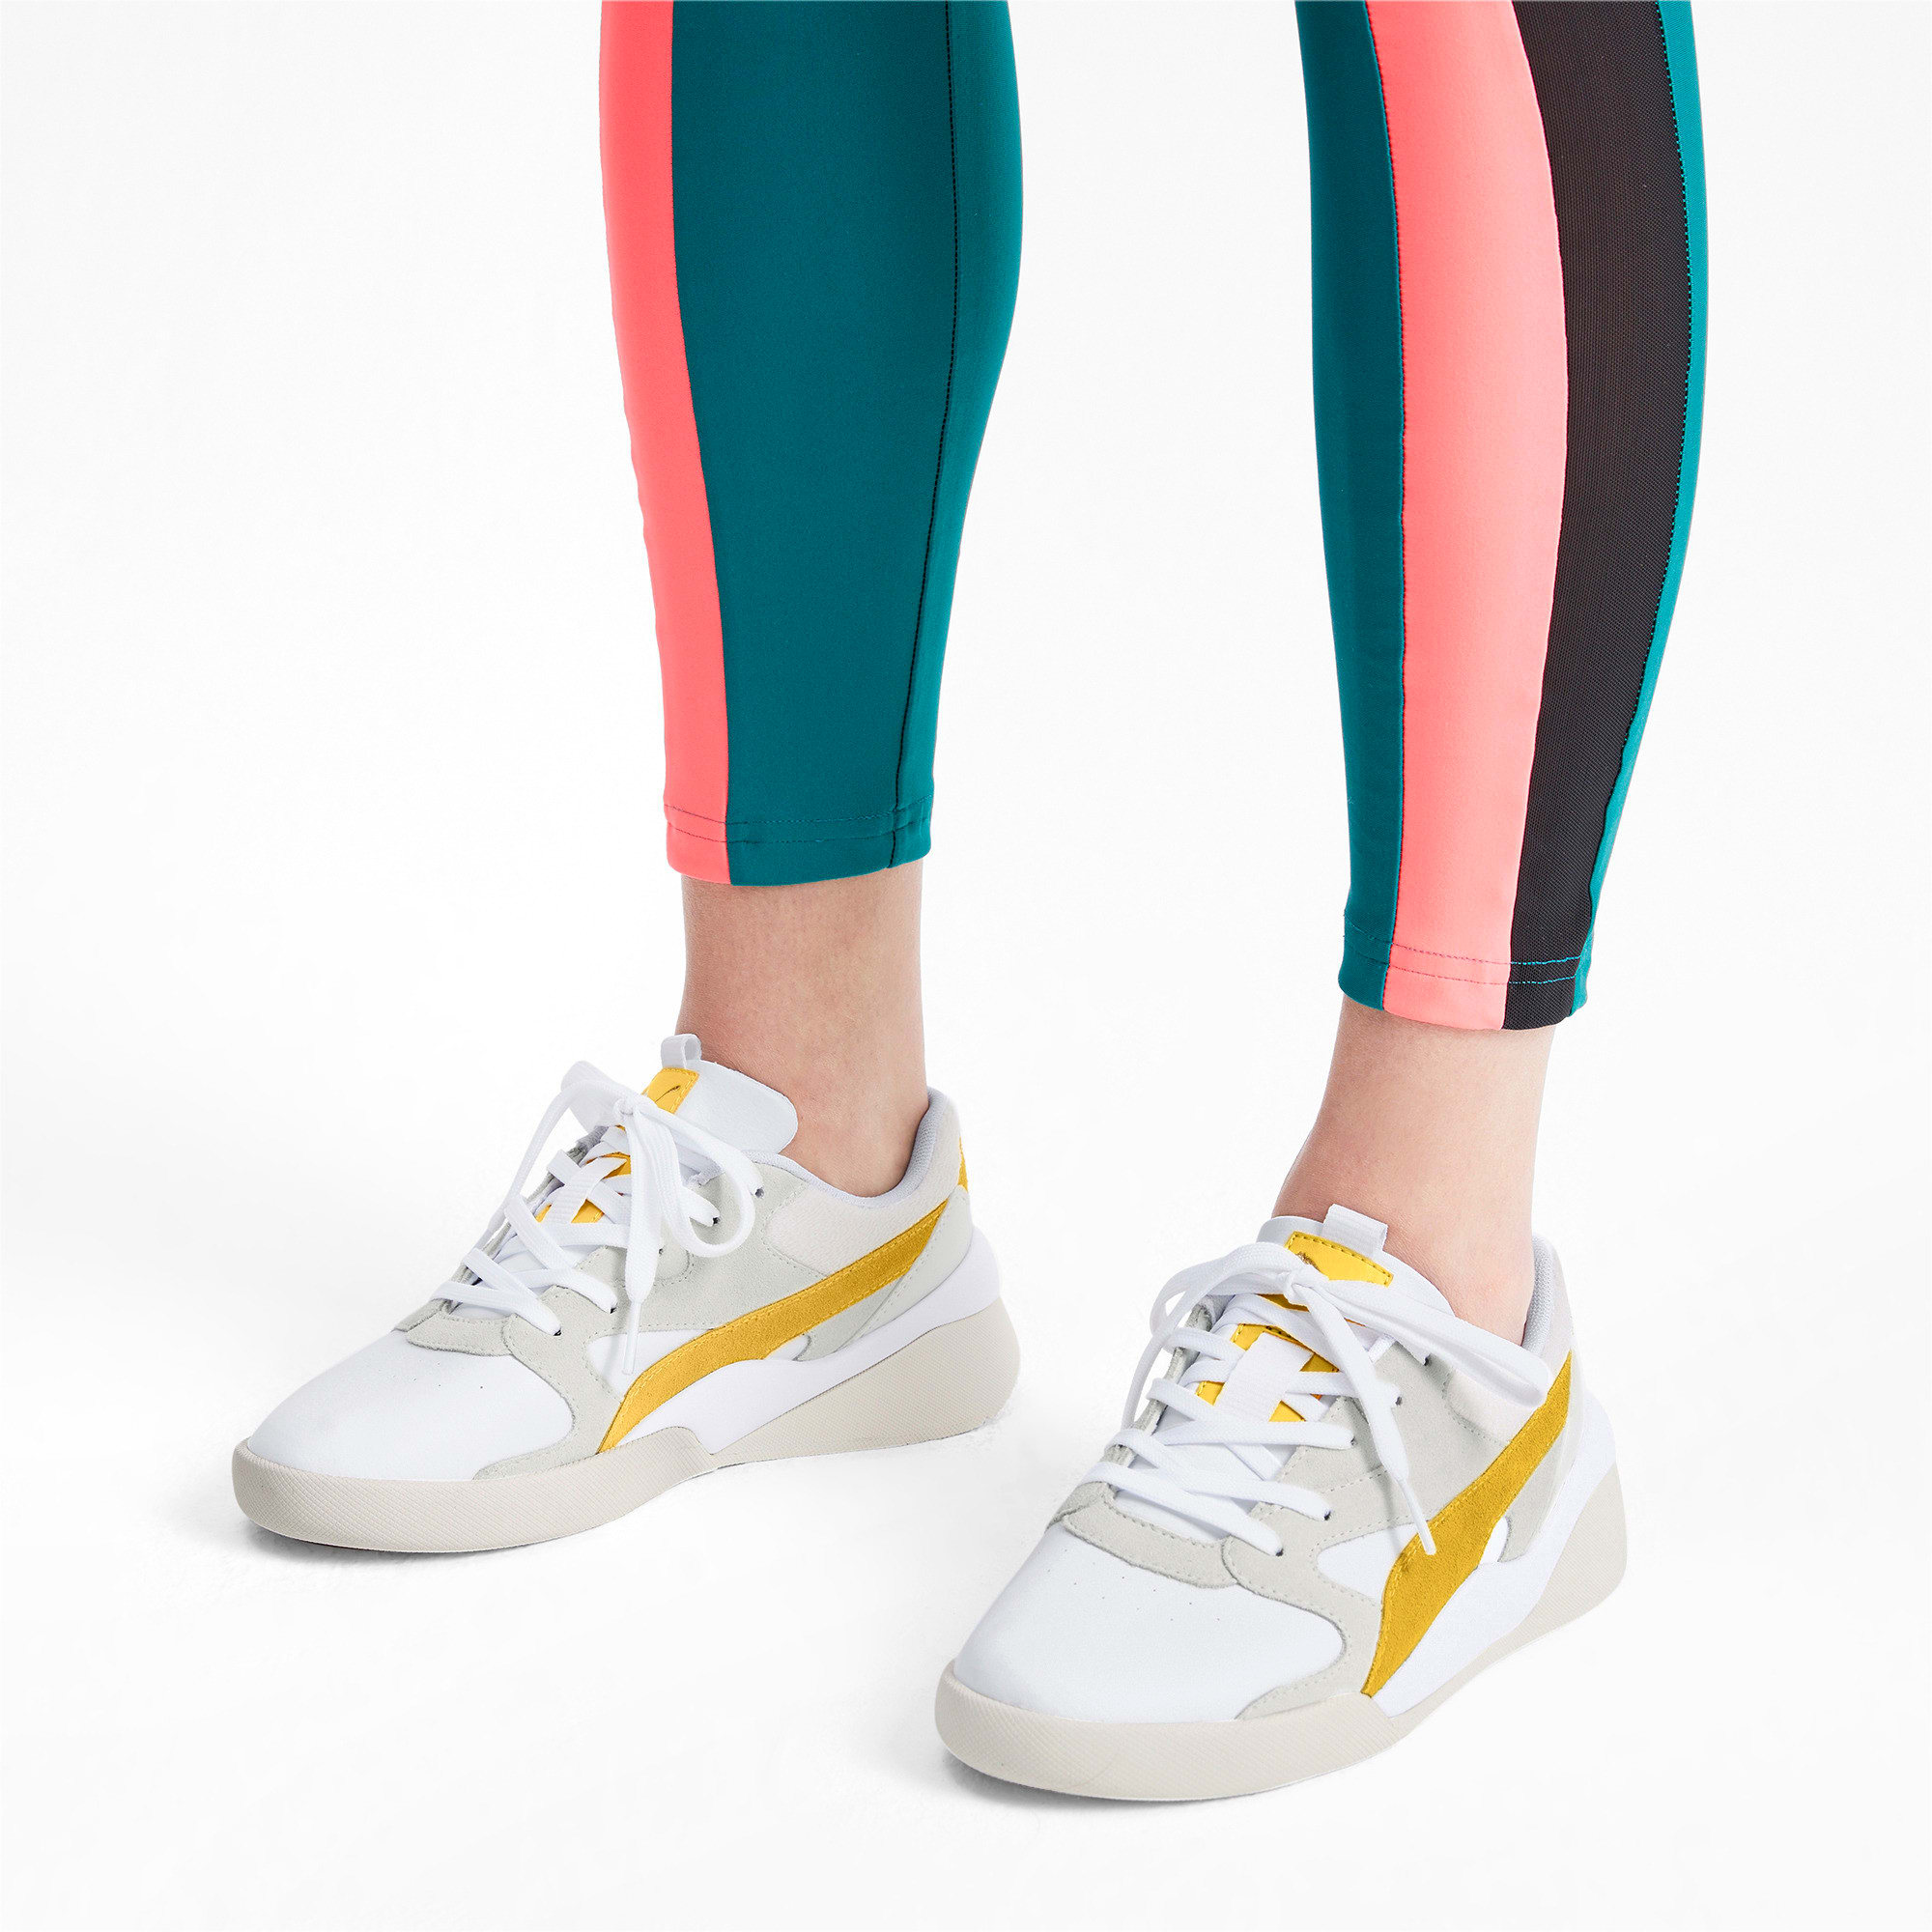 Thumbnail 2 of Aeon Heritage Women's Sneakers, Puma White-Sulphur, medium